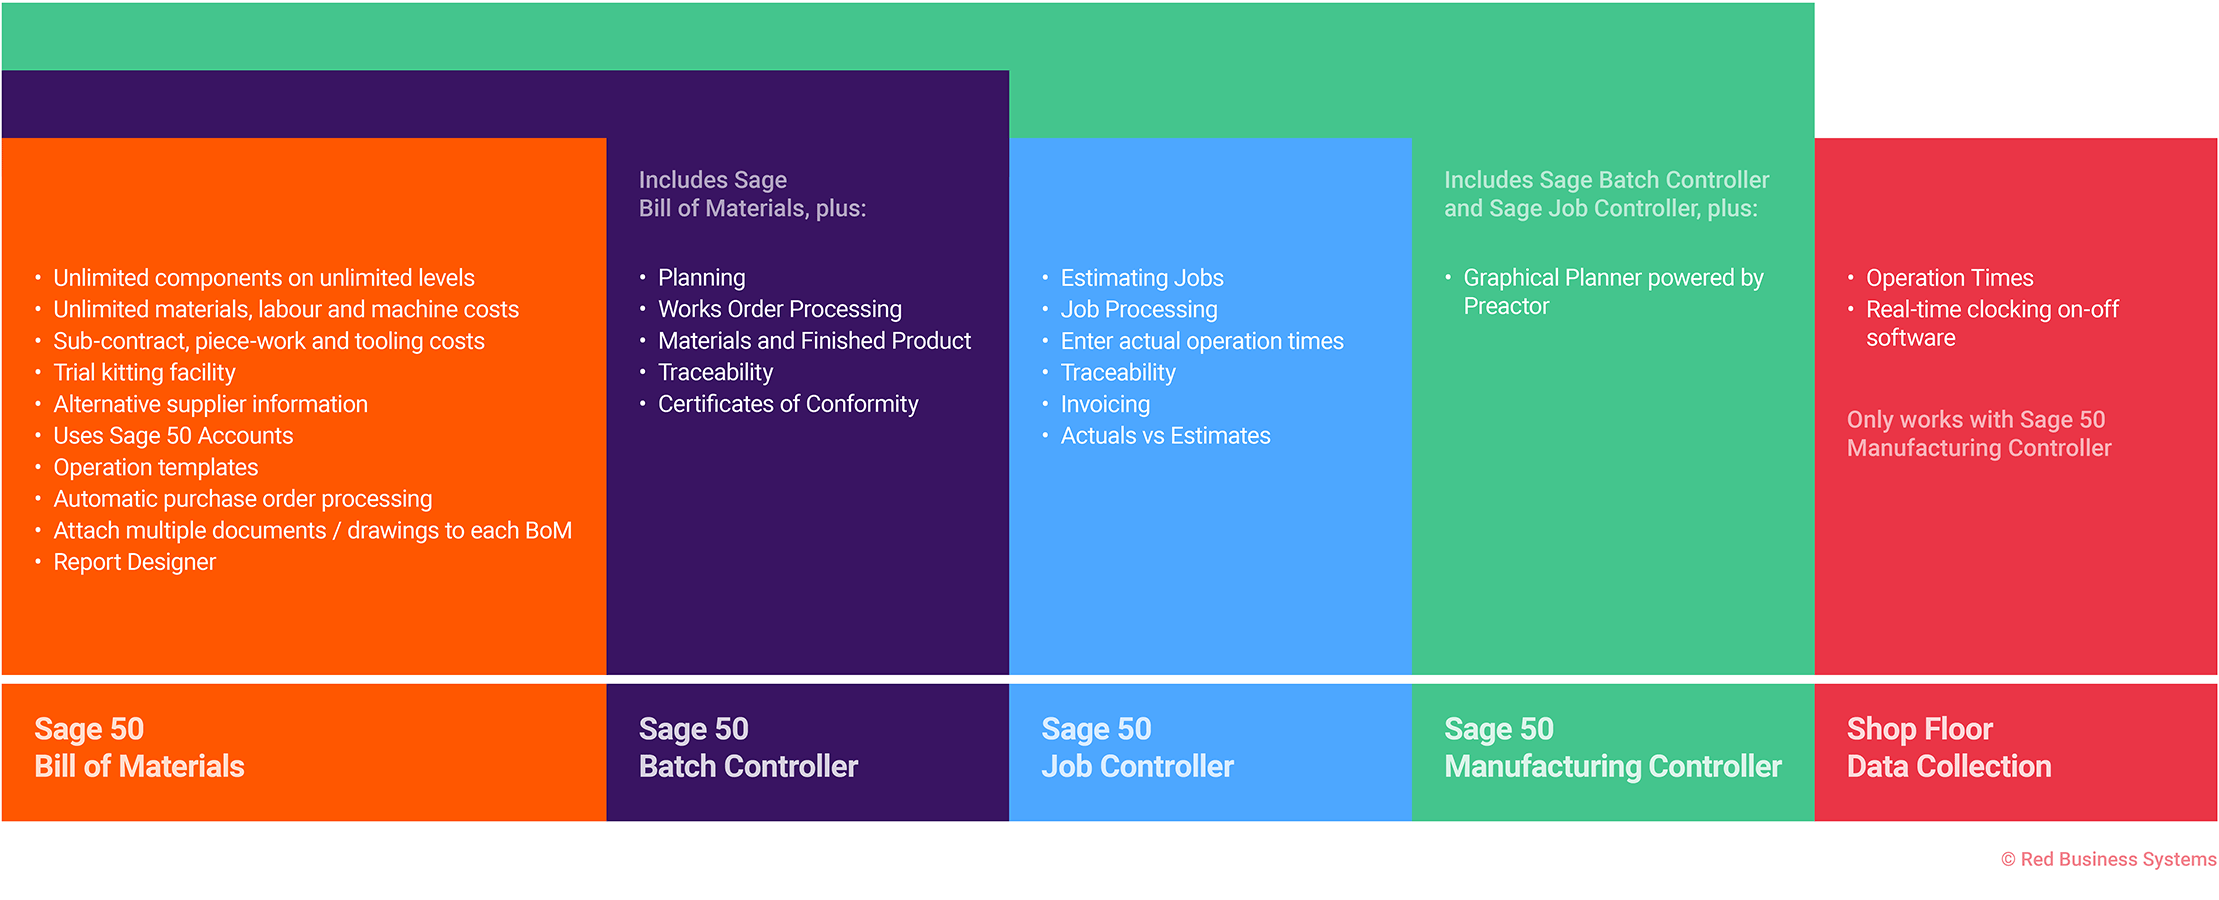 Sage Manufacturing variants venn